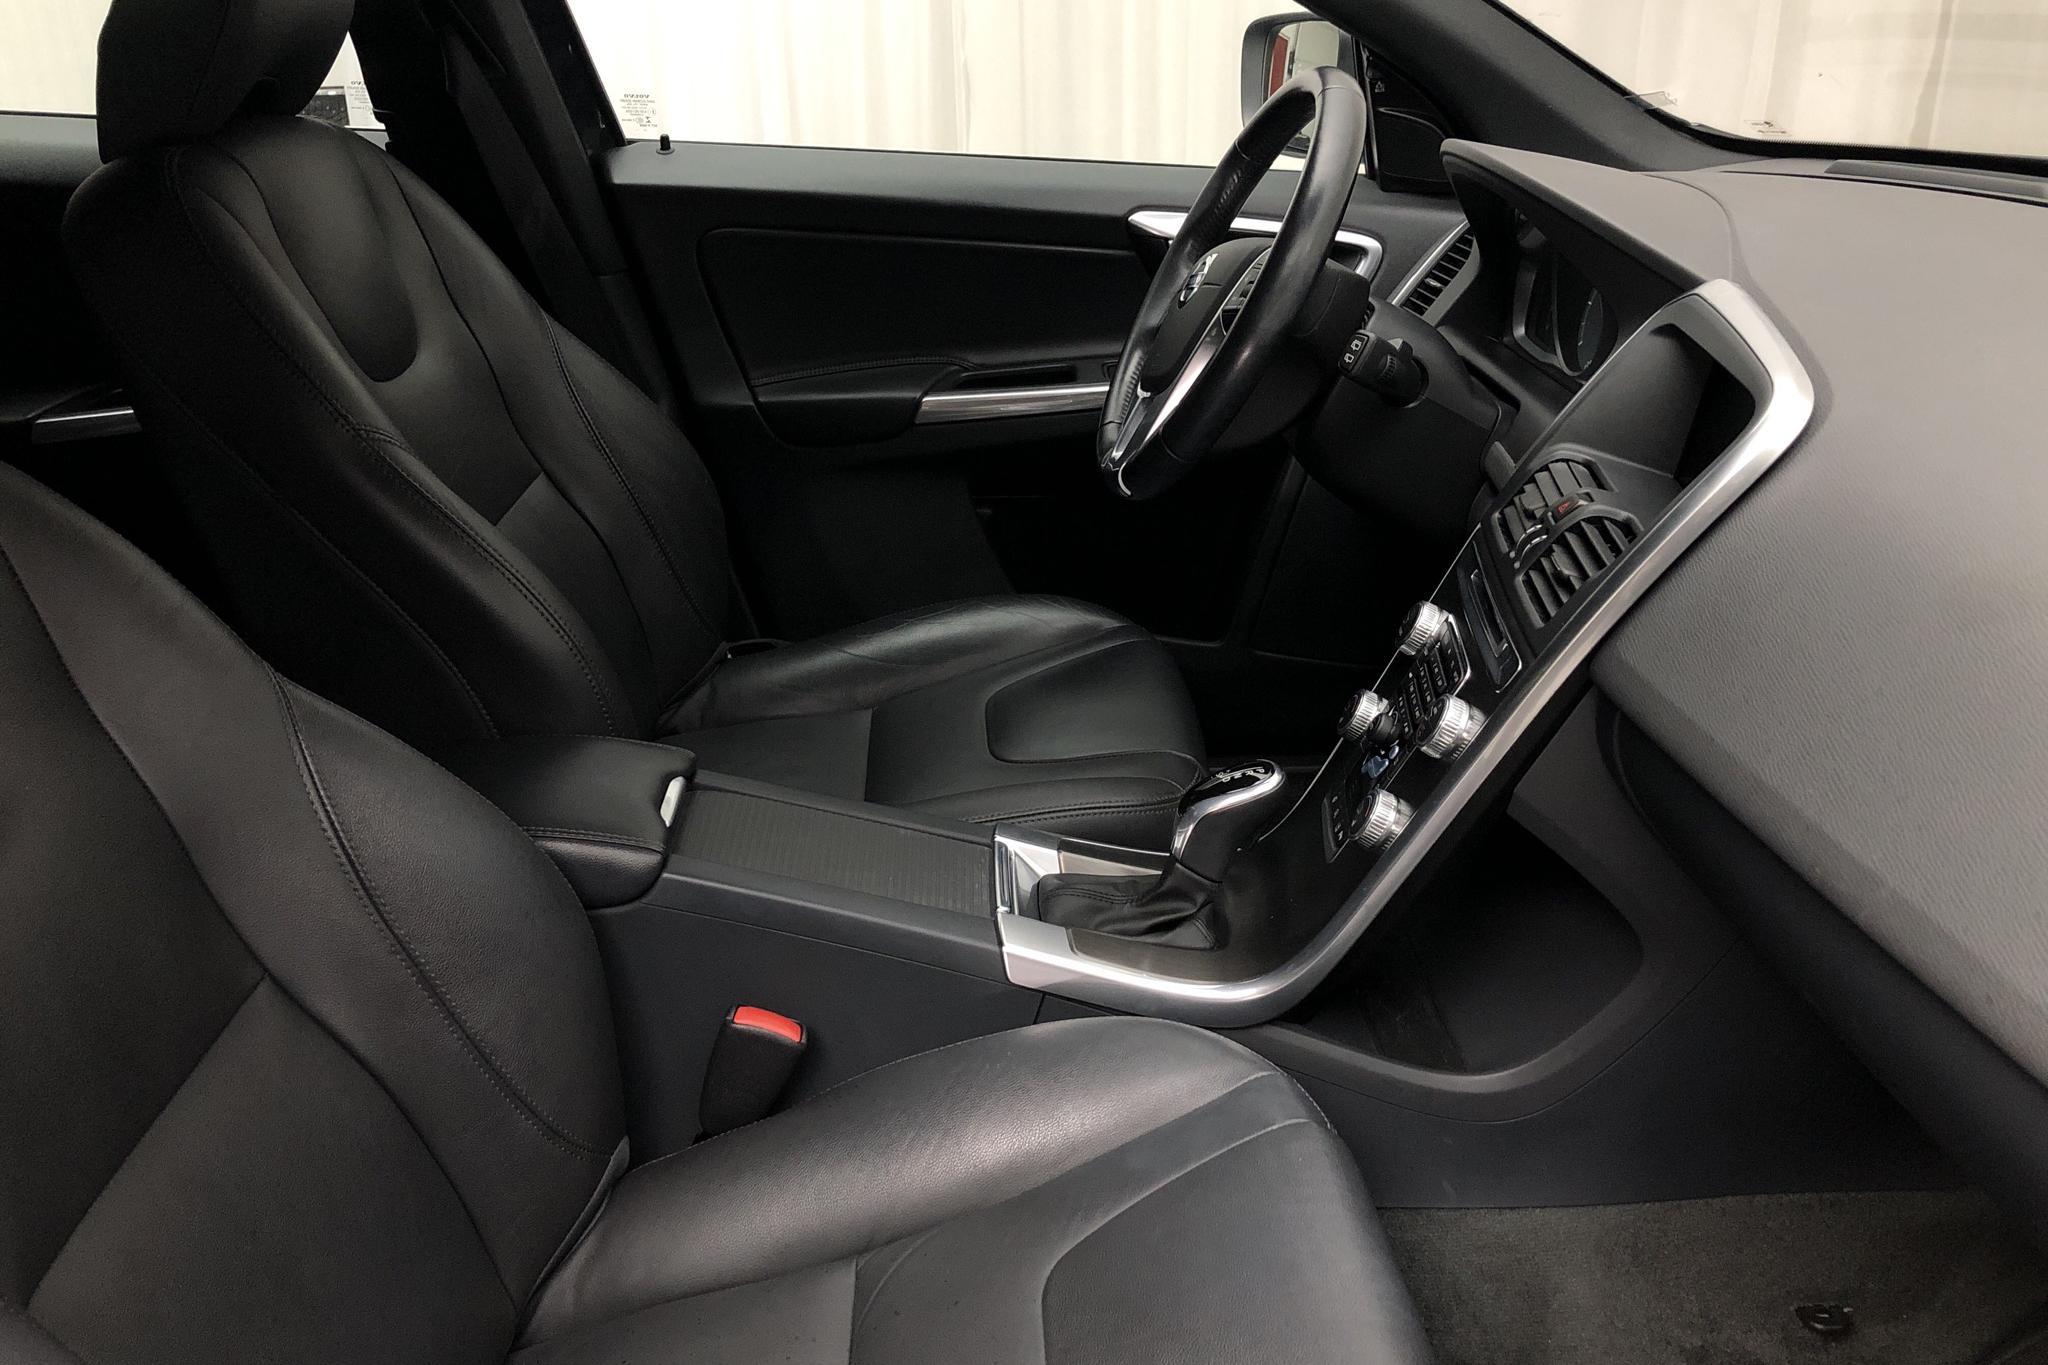 Volvo XC60 D4 2WD (181hk) - 121 860 km - Automatic - gray - 2015